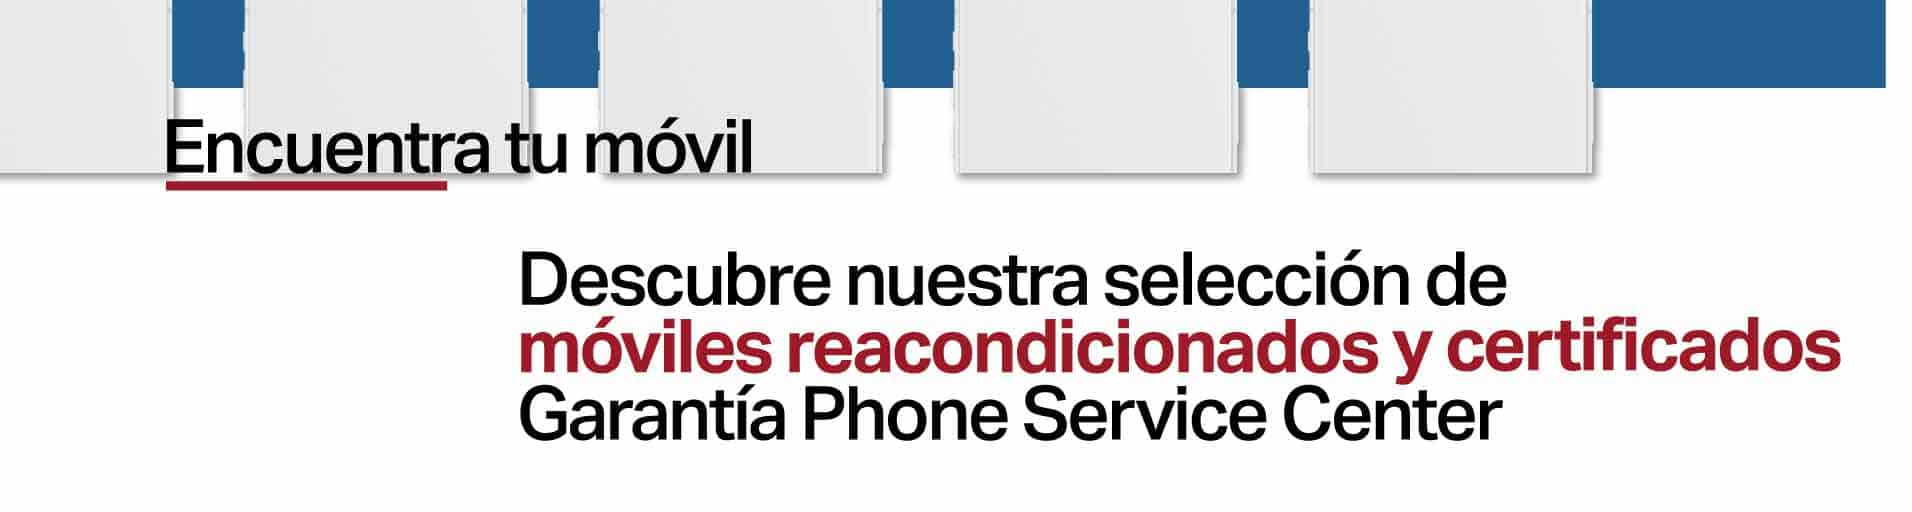 cubre-mi-movil-mojado-tienda-online-phone-service-center